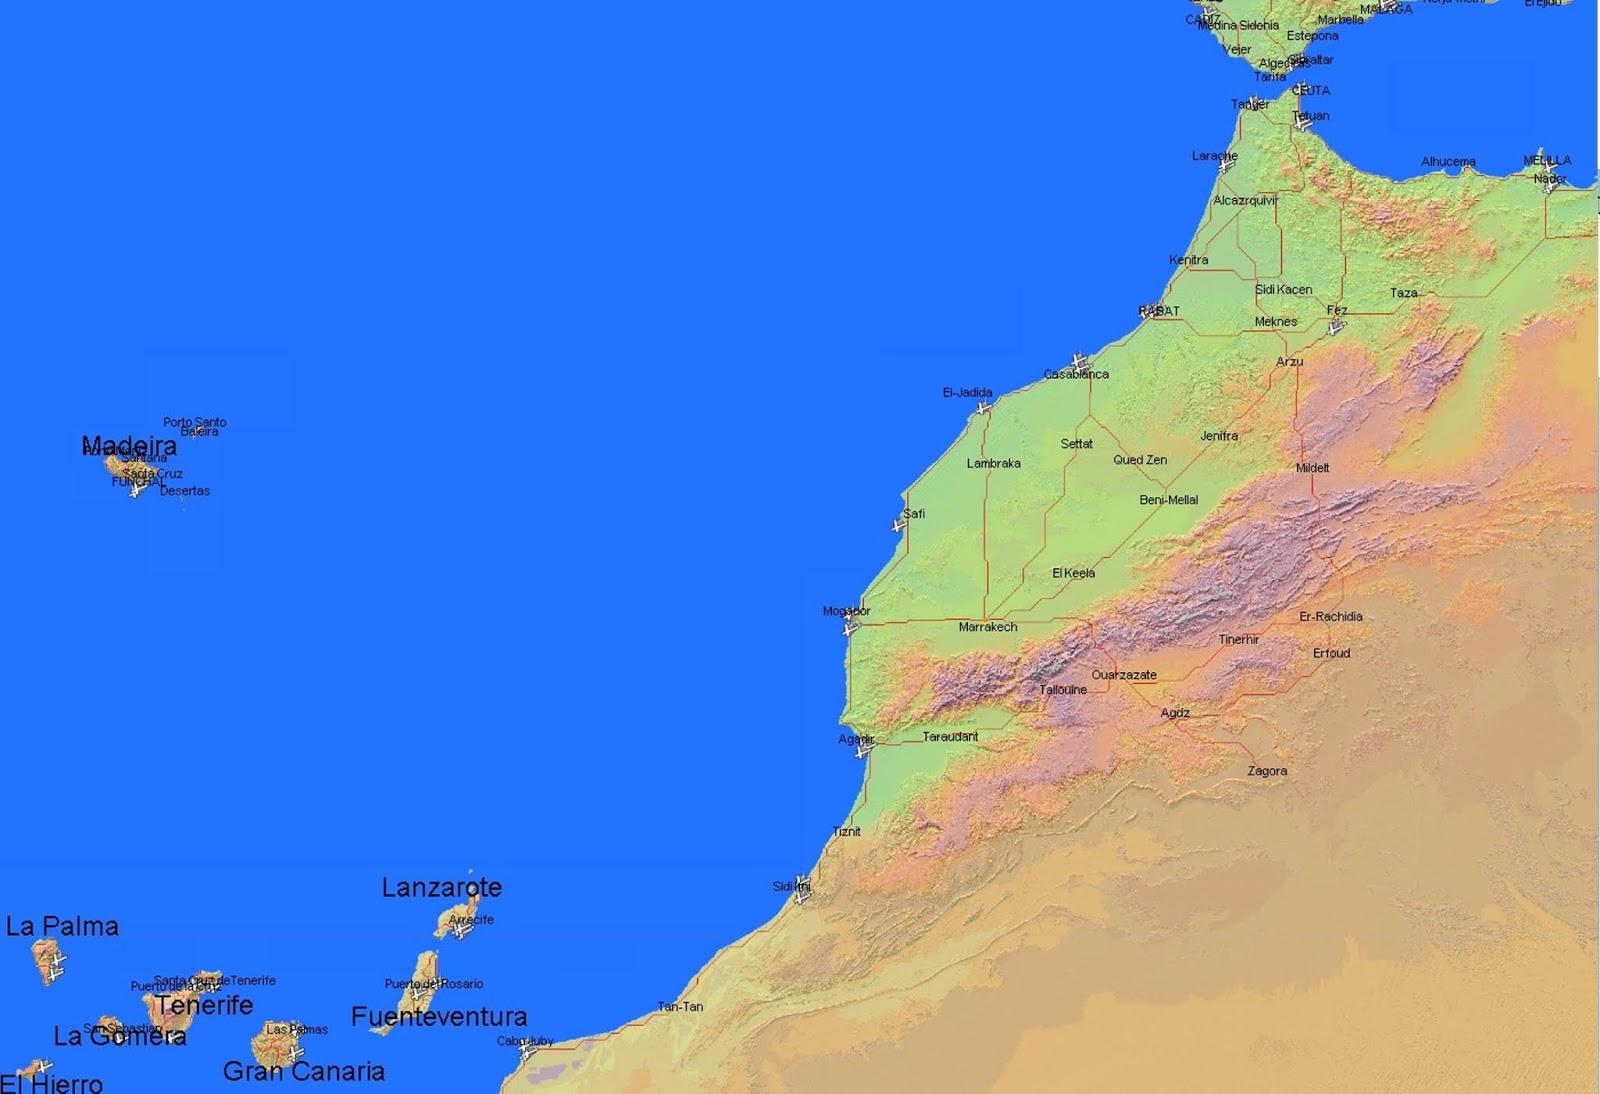 Canarias%2BMarruecos%2B.bmp